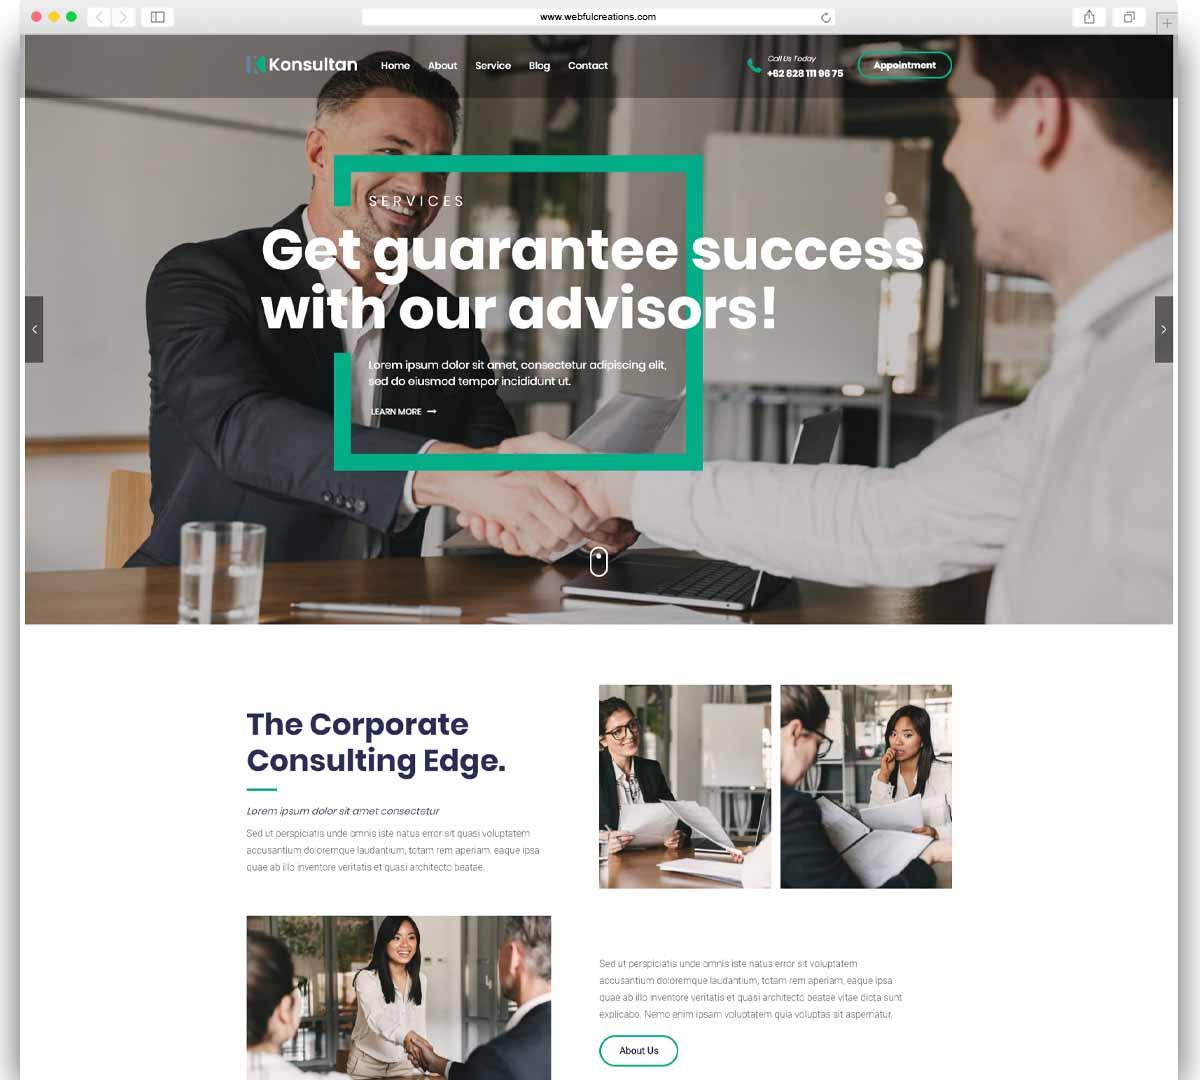 Konsultan - Consulting Business WordPress Theme